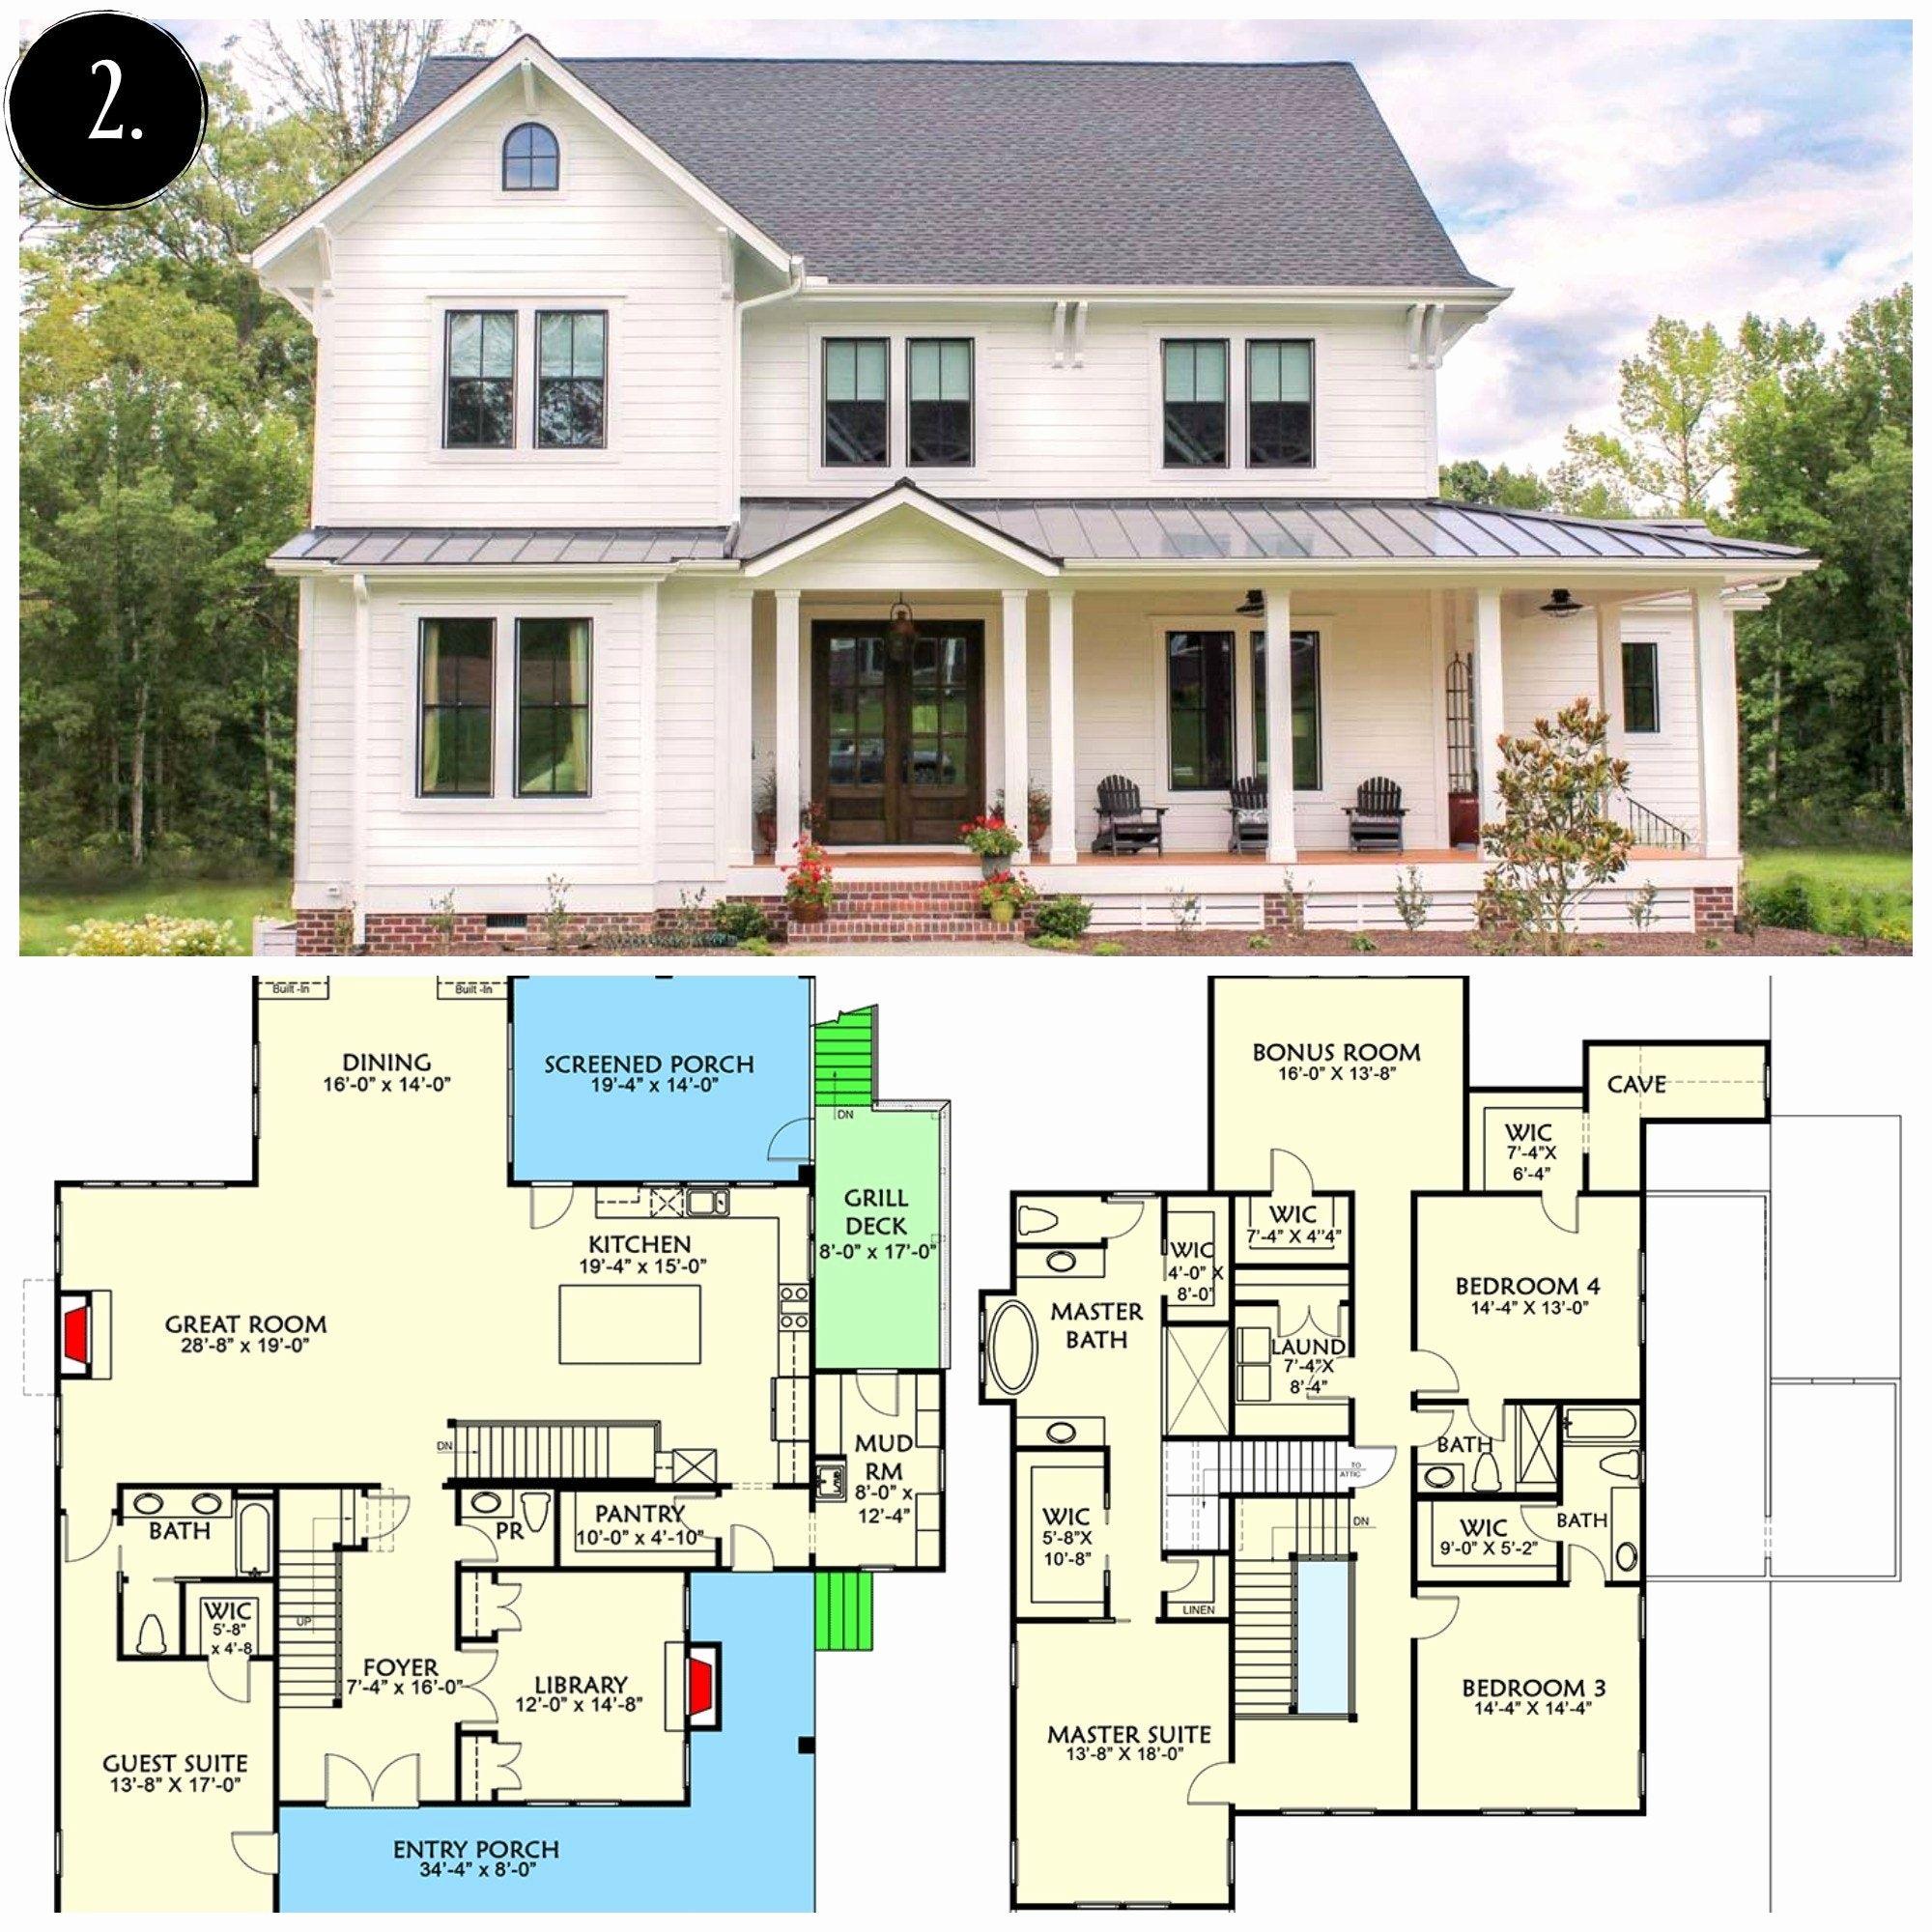 2 Bedroom Modern Farmhouse Plans Novocom Top